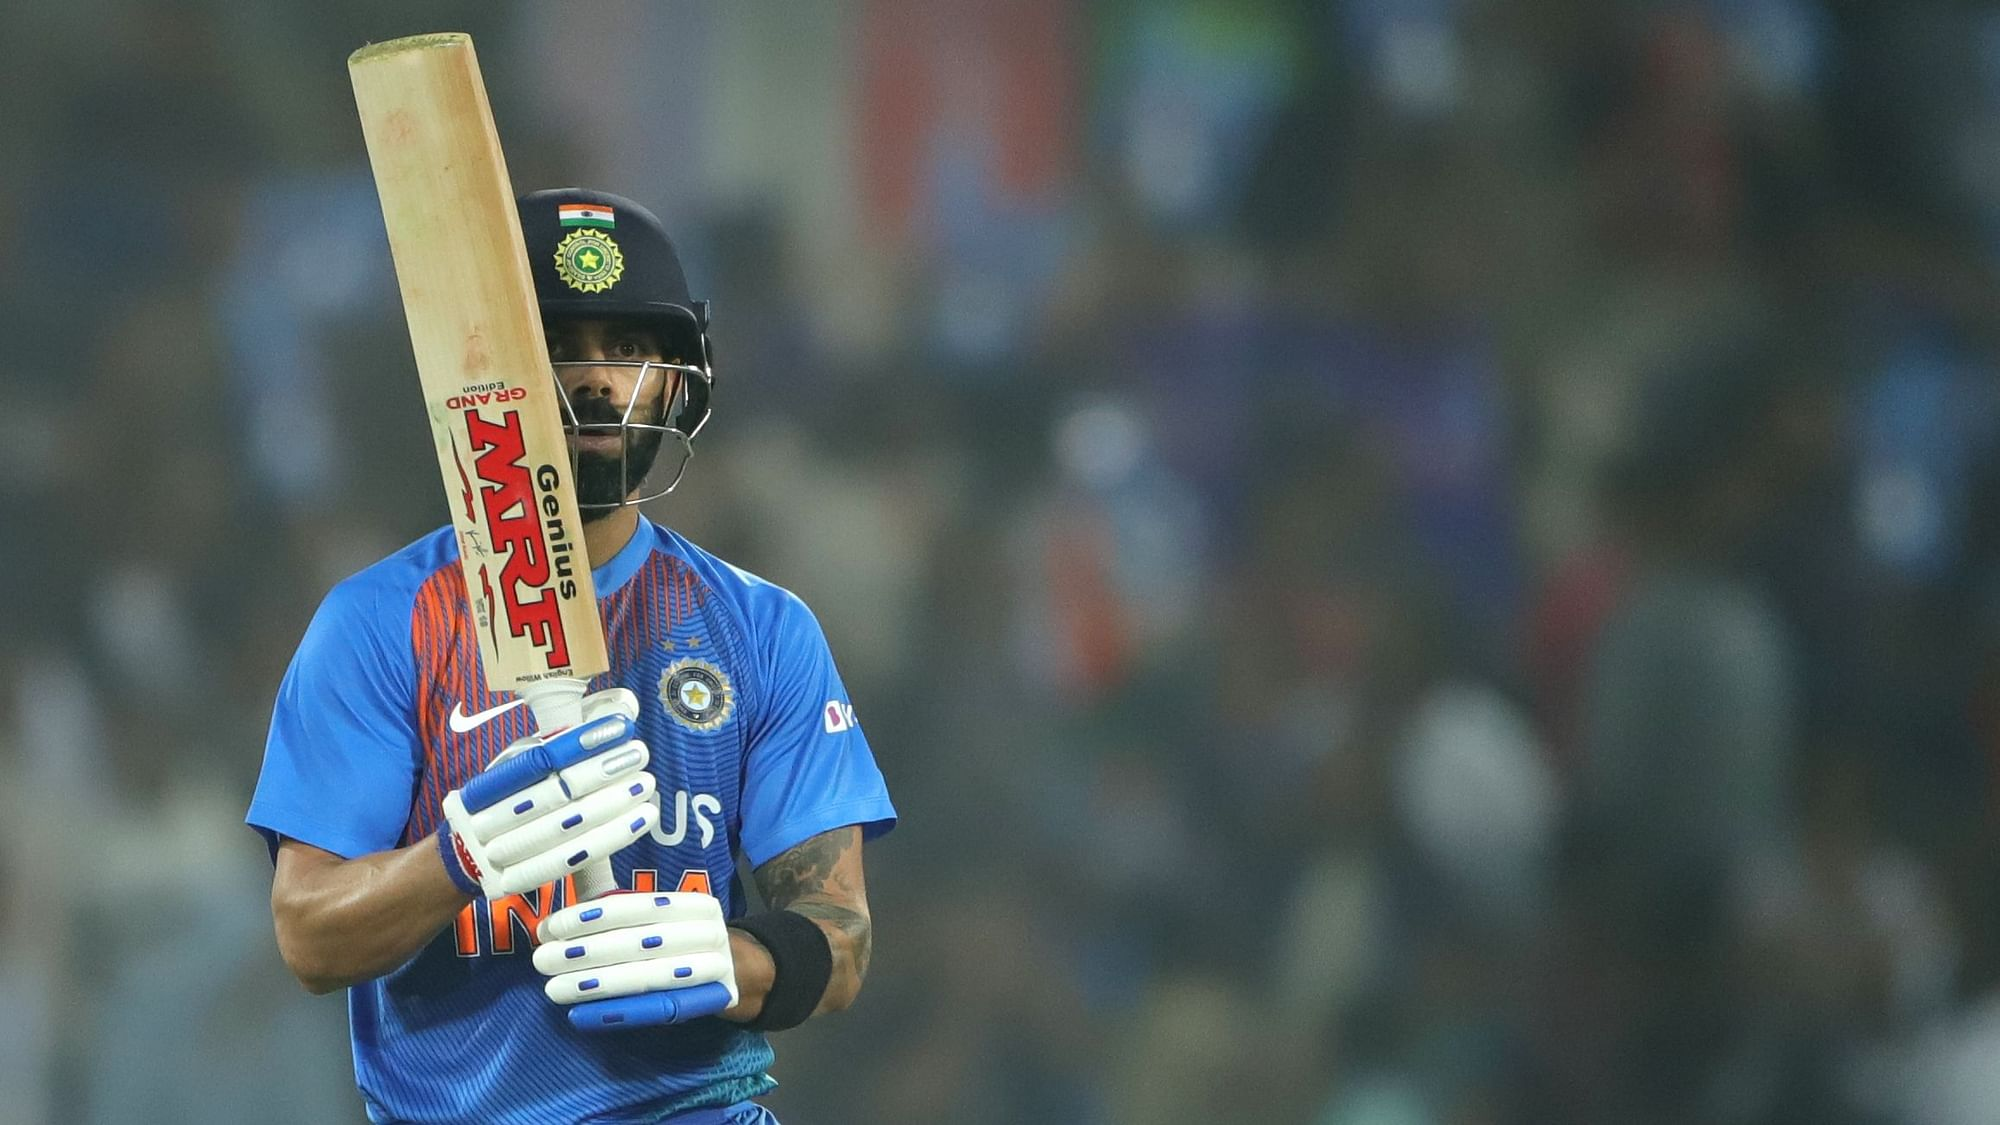 Records Tumble After Virat Kohli's Classy 94 Not Out vs Windies